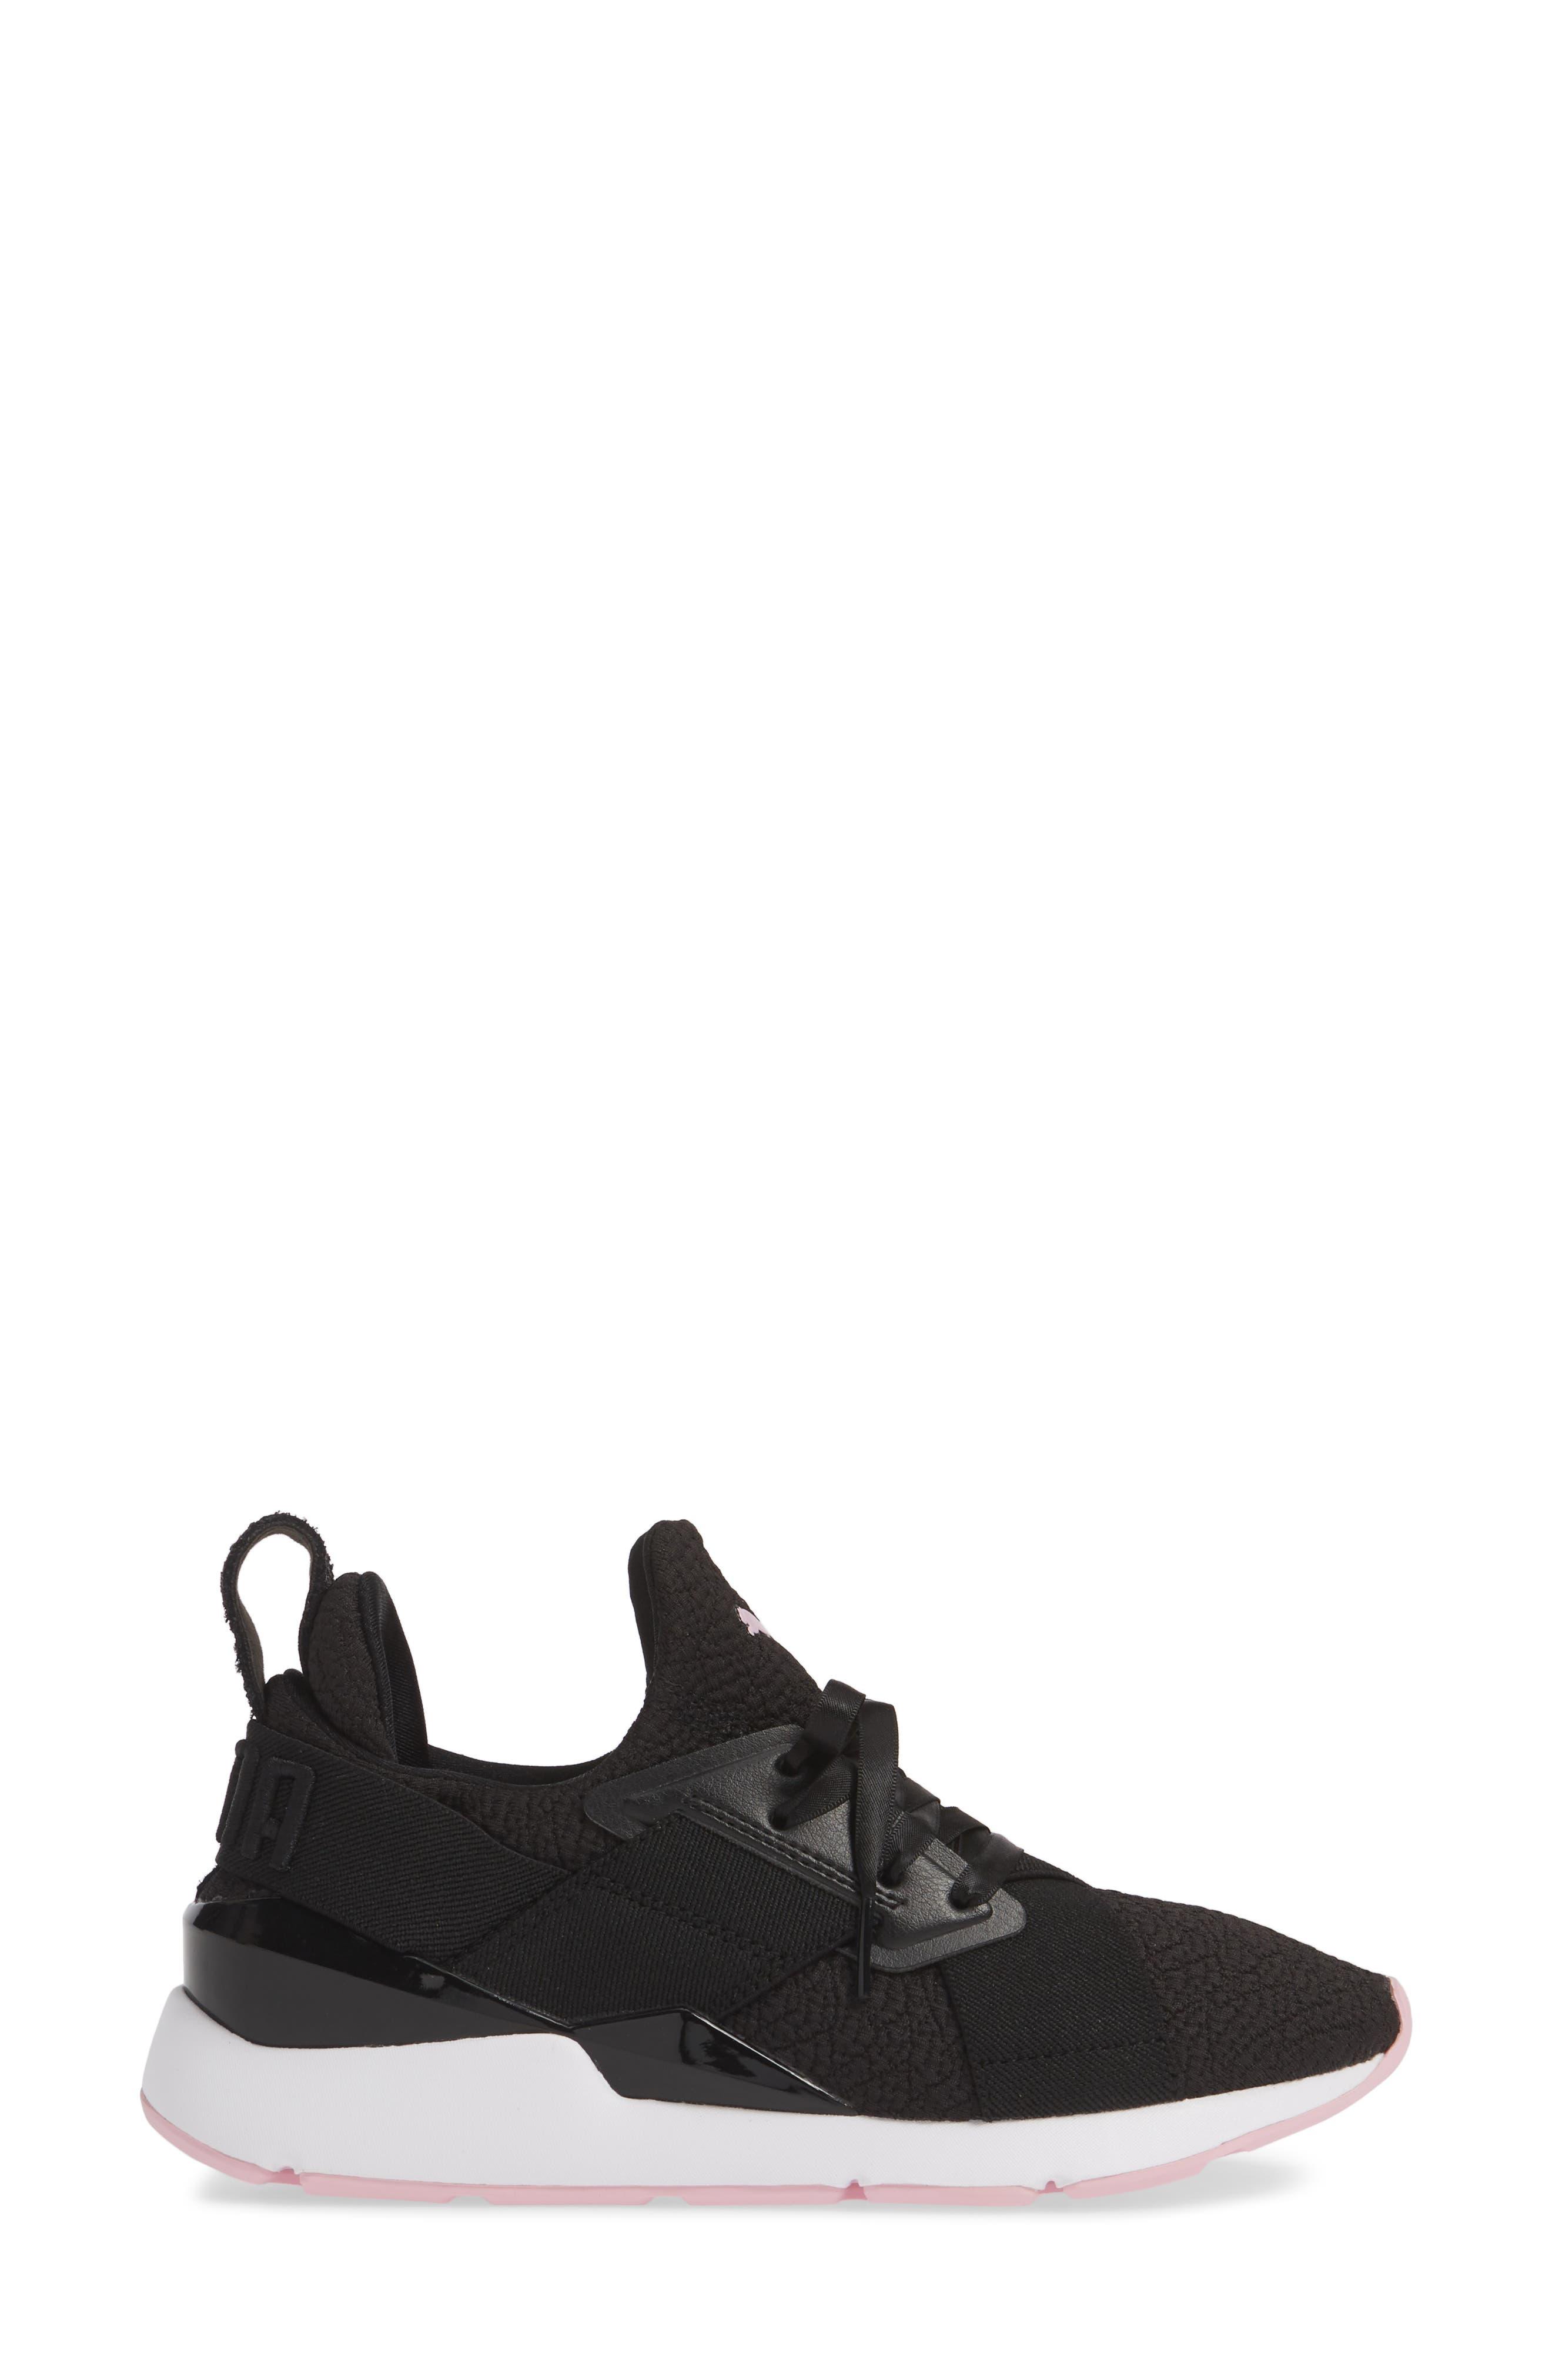 PUMA, Muse TZ Sneaker, Alternate thumbnail 3, color, BLACK/ PALE PINK